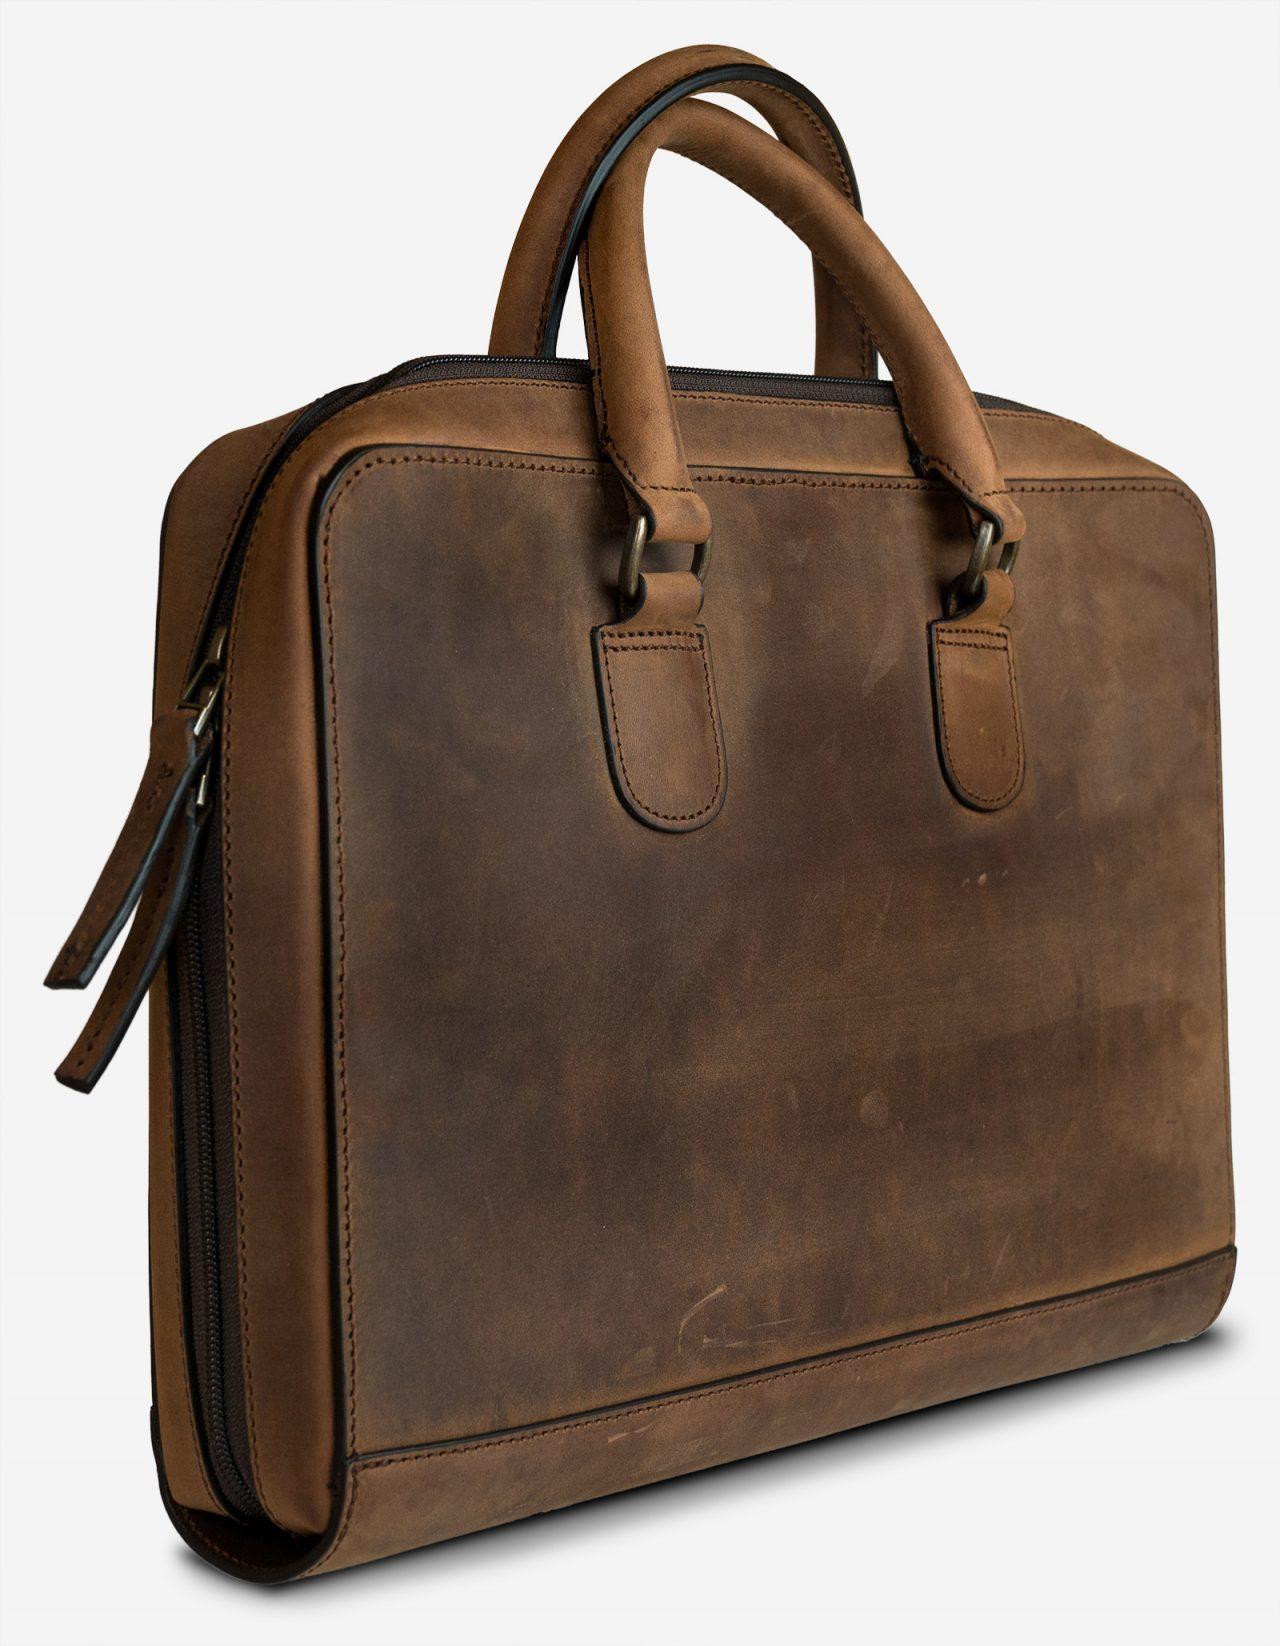 Full-grain leather portfolio briefcase.